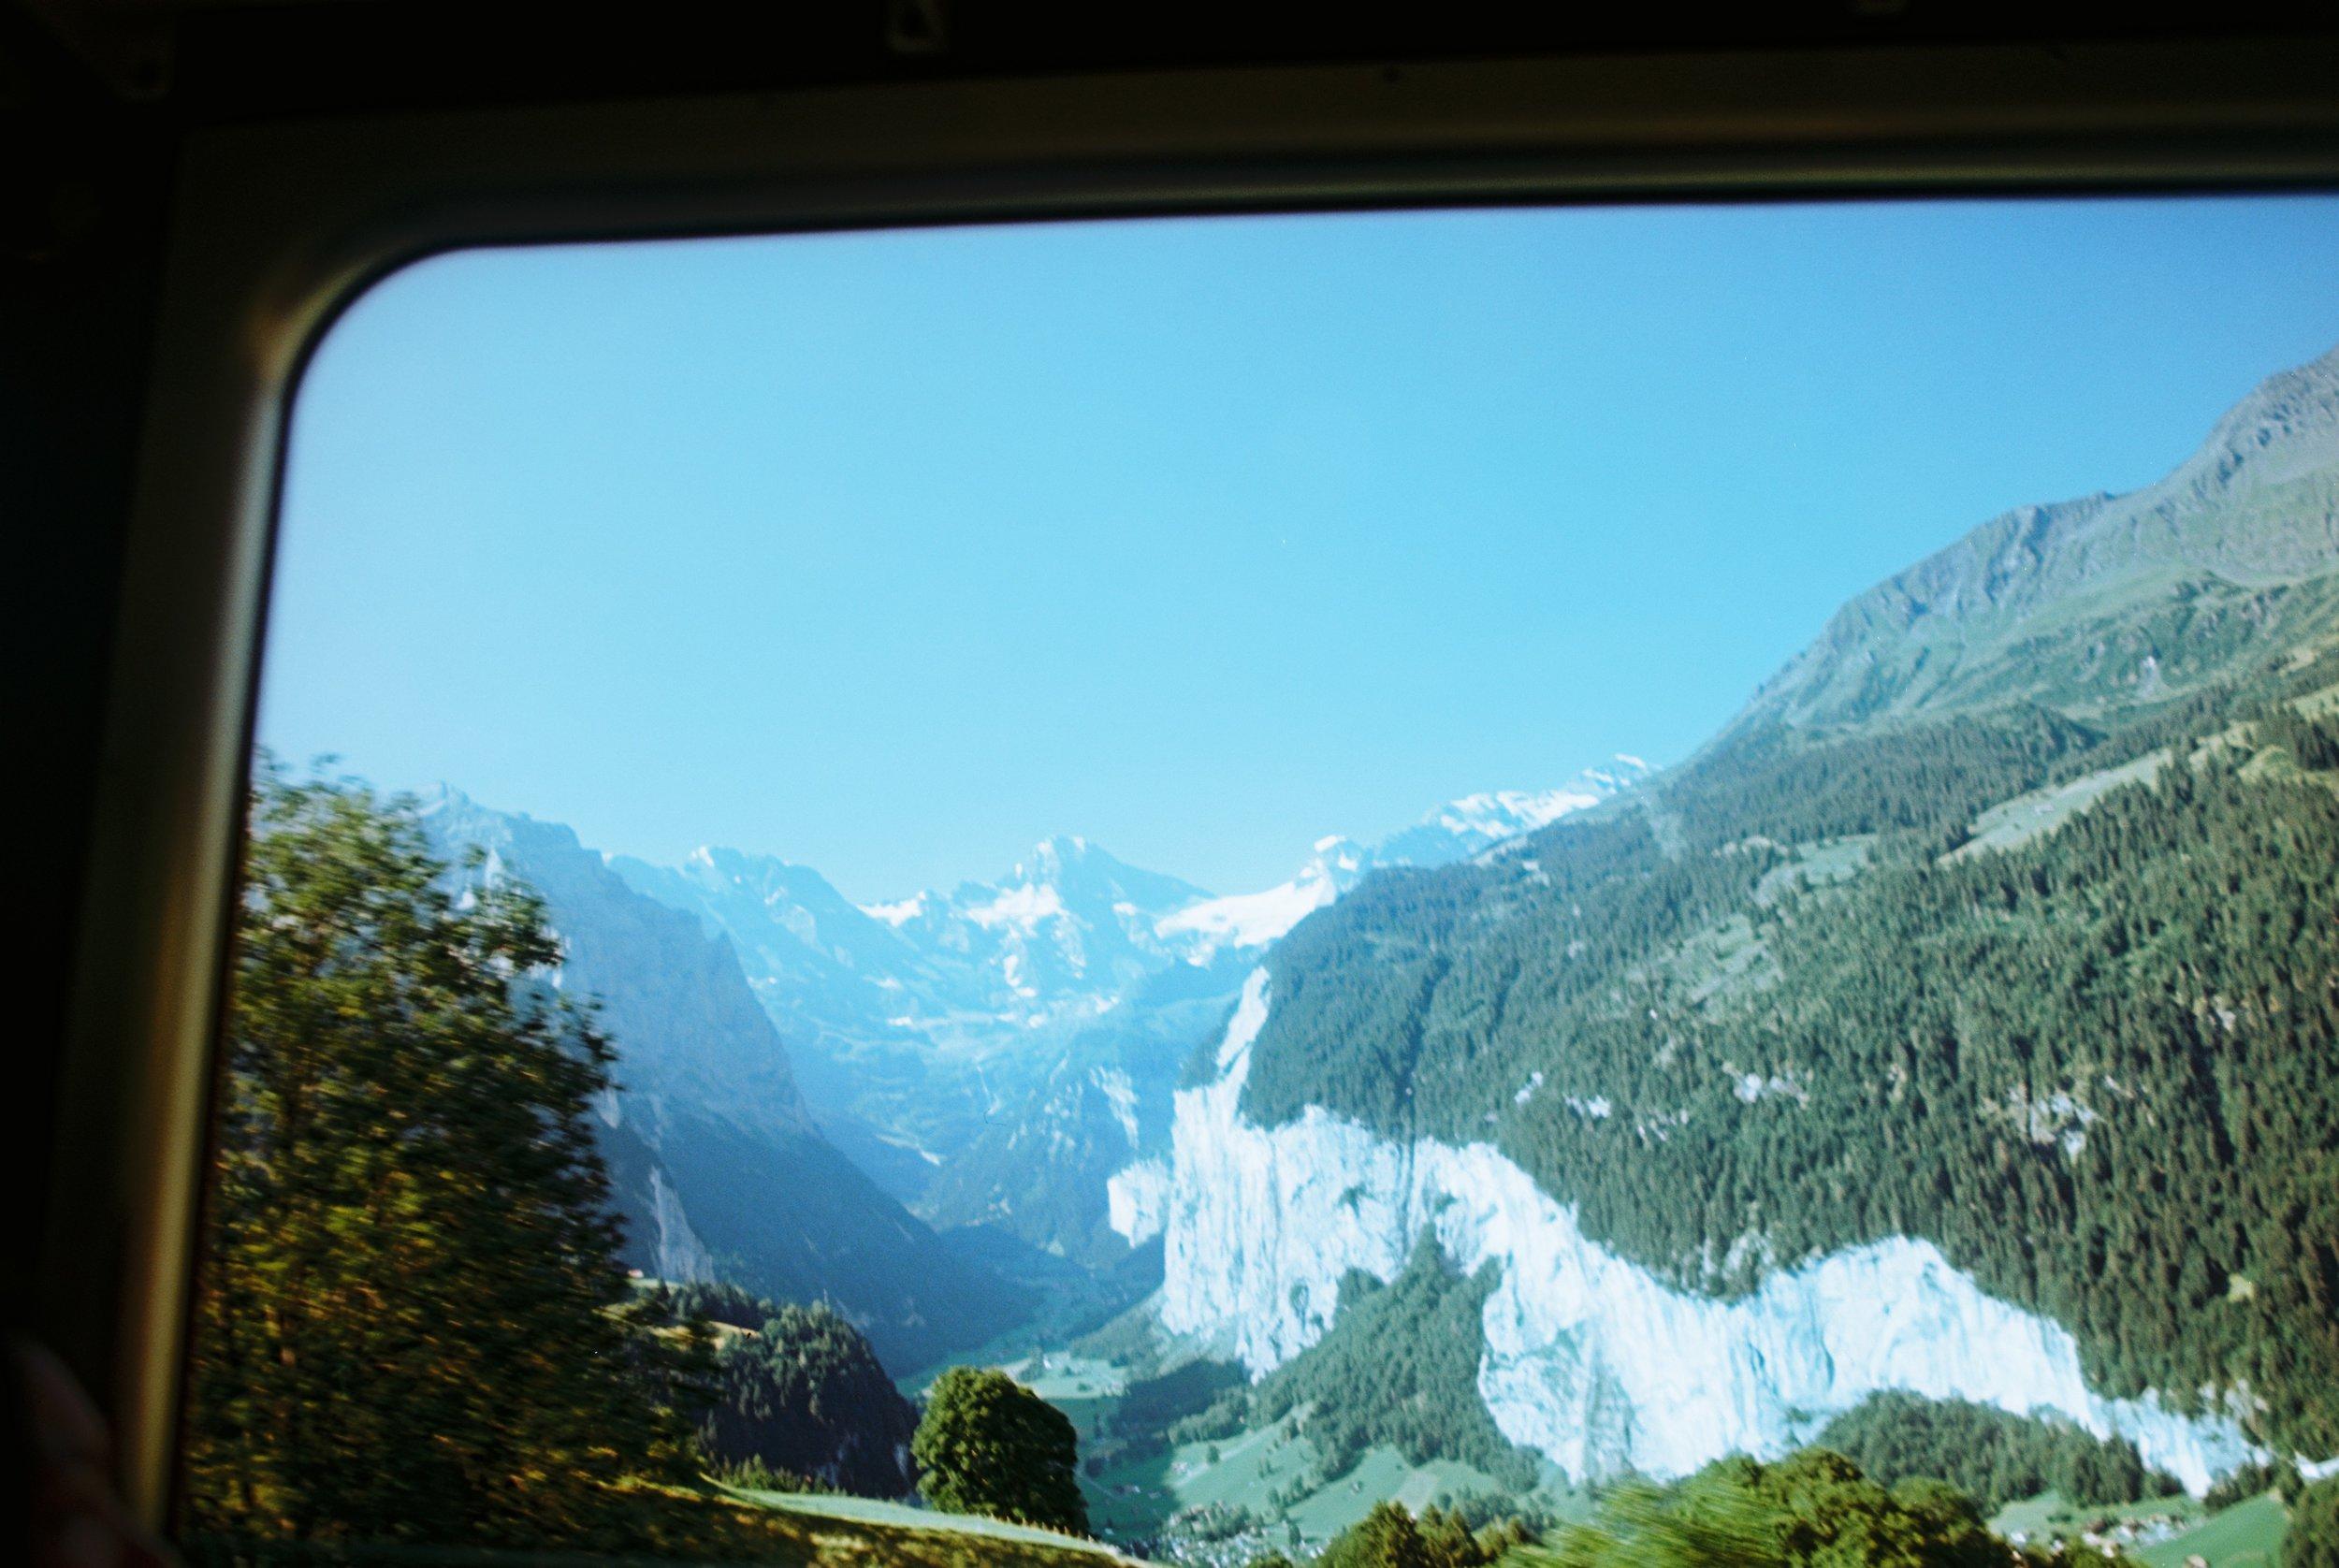 Lauterbrunnen Valley, on the path to Jungfrau, Switzerland